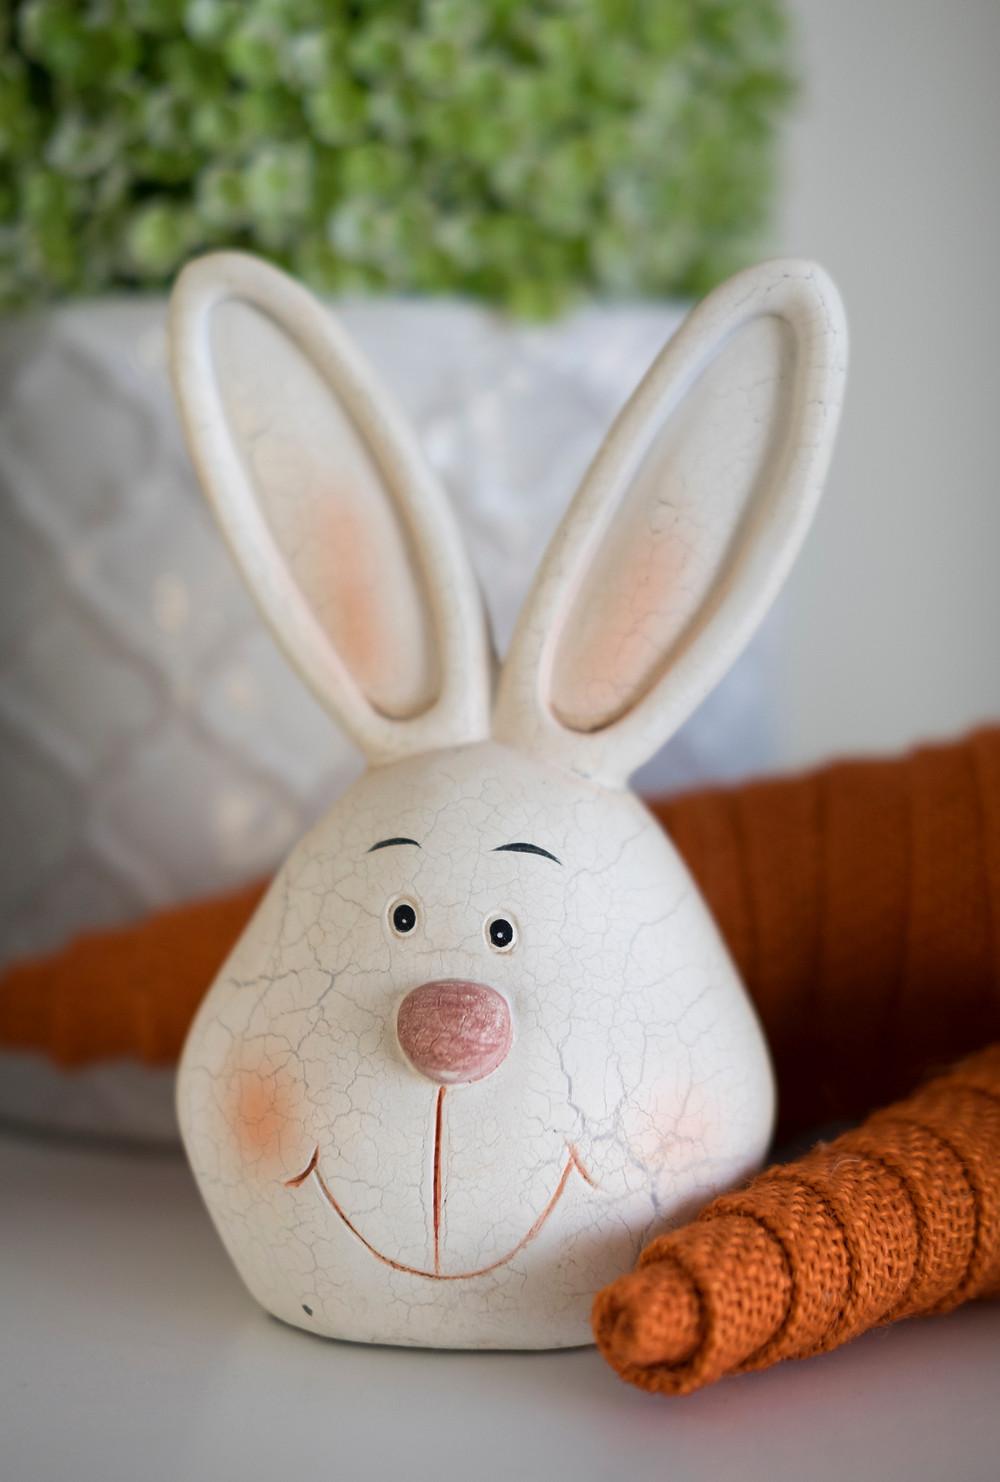 Easter Bunny, Easter Bunny Ideas, Easter Bunny Letter, Easter Bunny Games, Easter Bunny Stencil